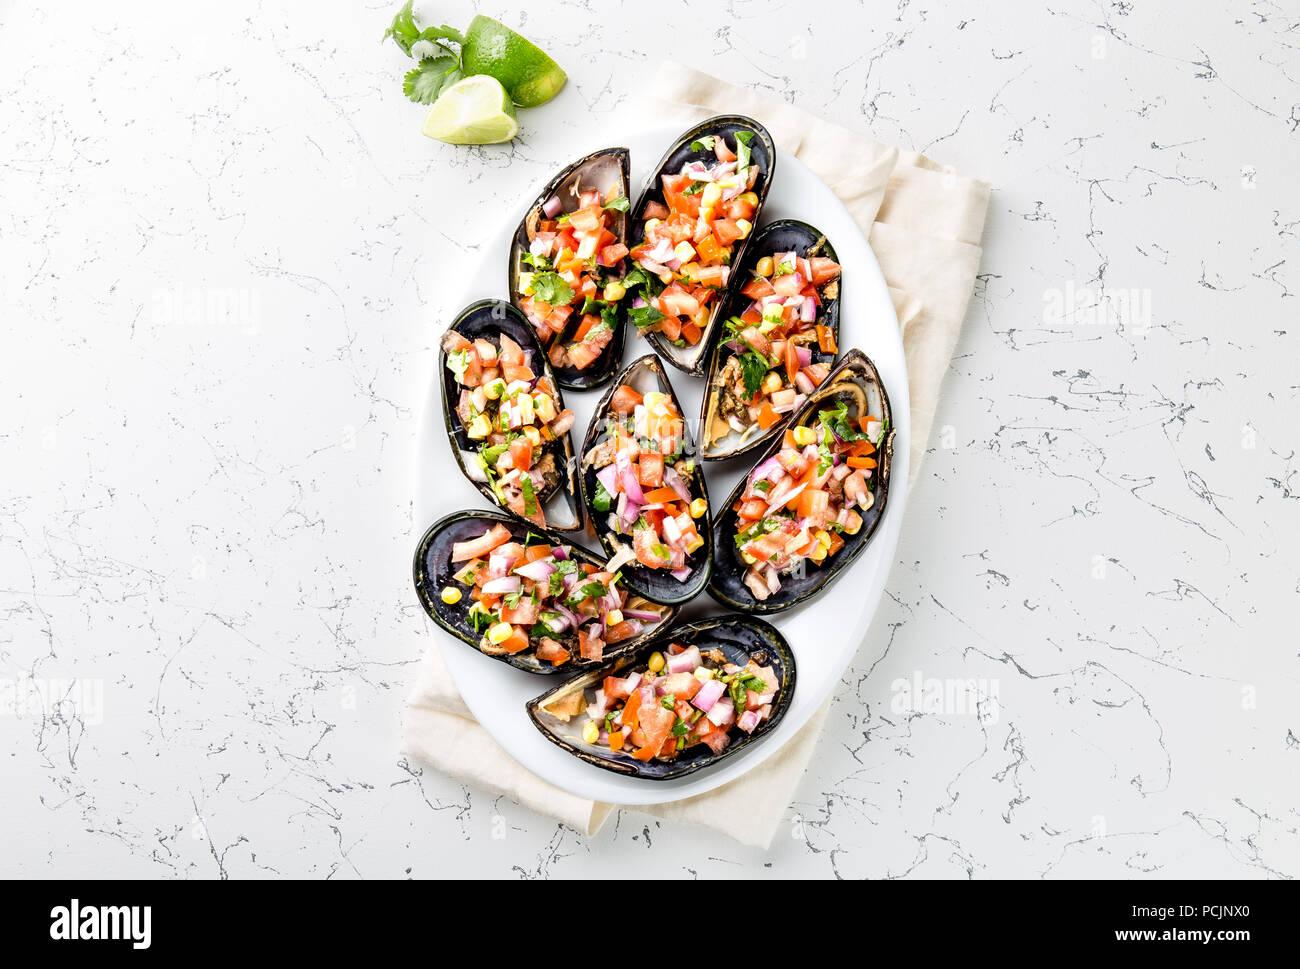 PERUVIAN FOOD. Choros a la chalaca. Big mussels, choros zapatos seasoned with purple onion, tomatoes, corn and lemon. Top view, white background. Traditional peruvian dish - Stock Image